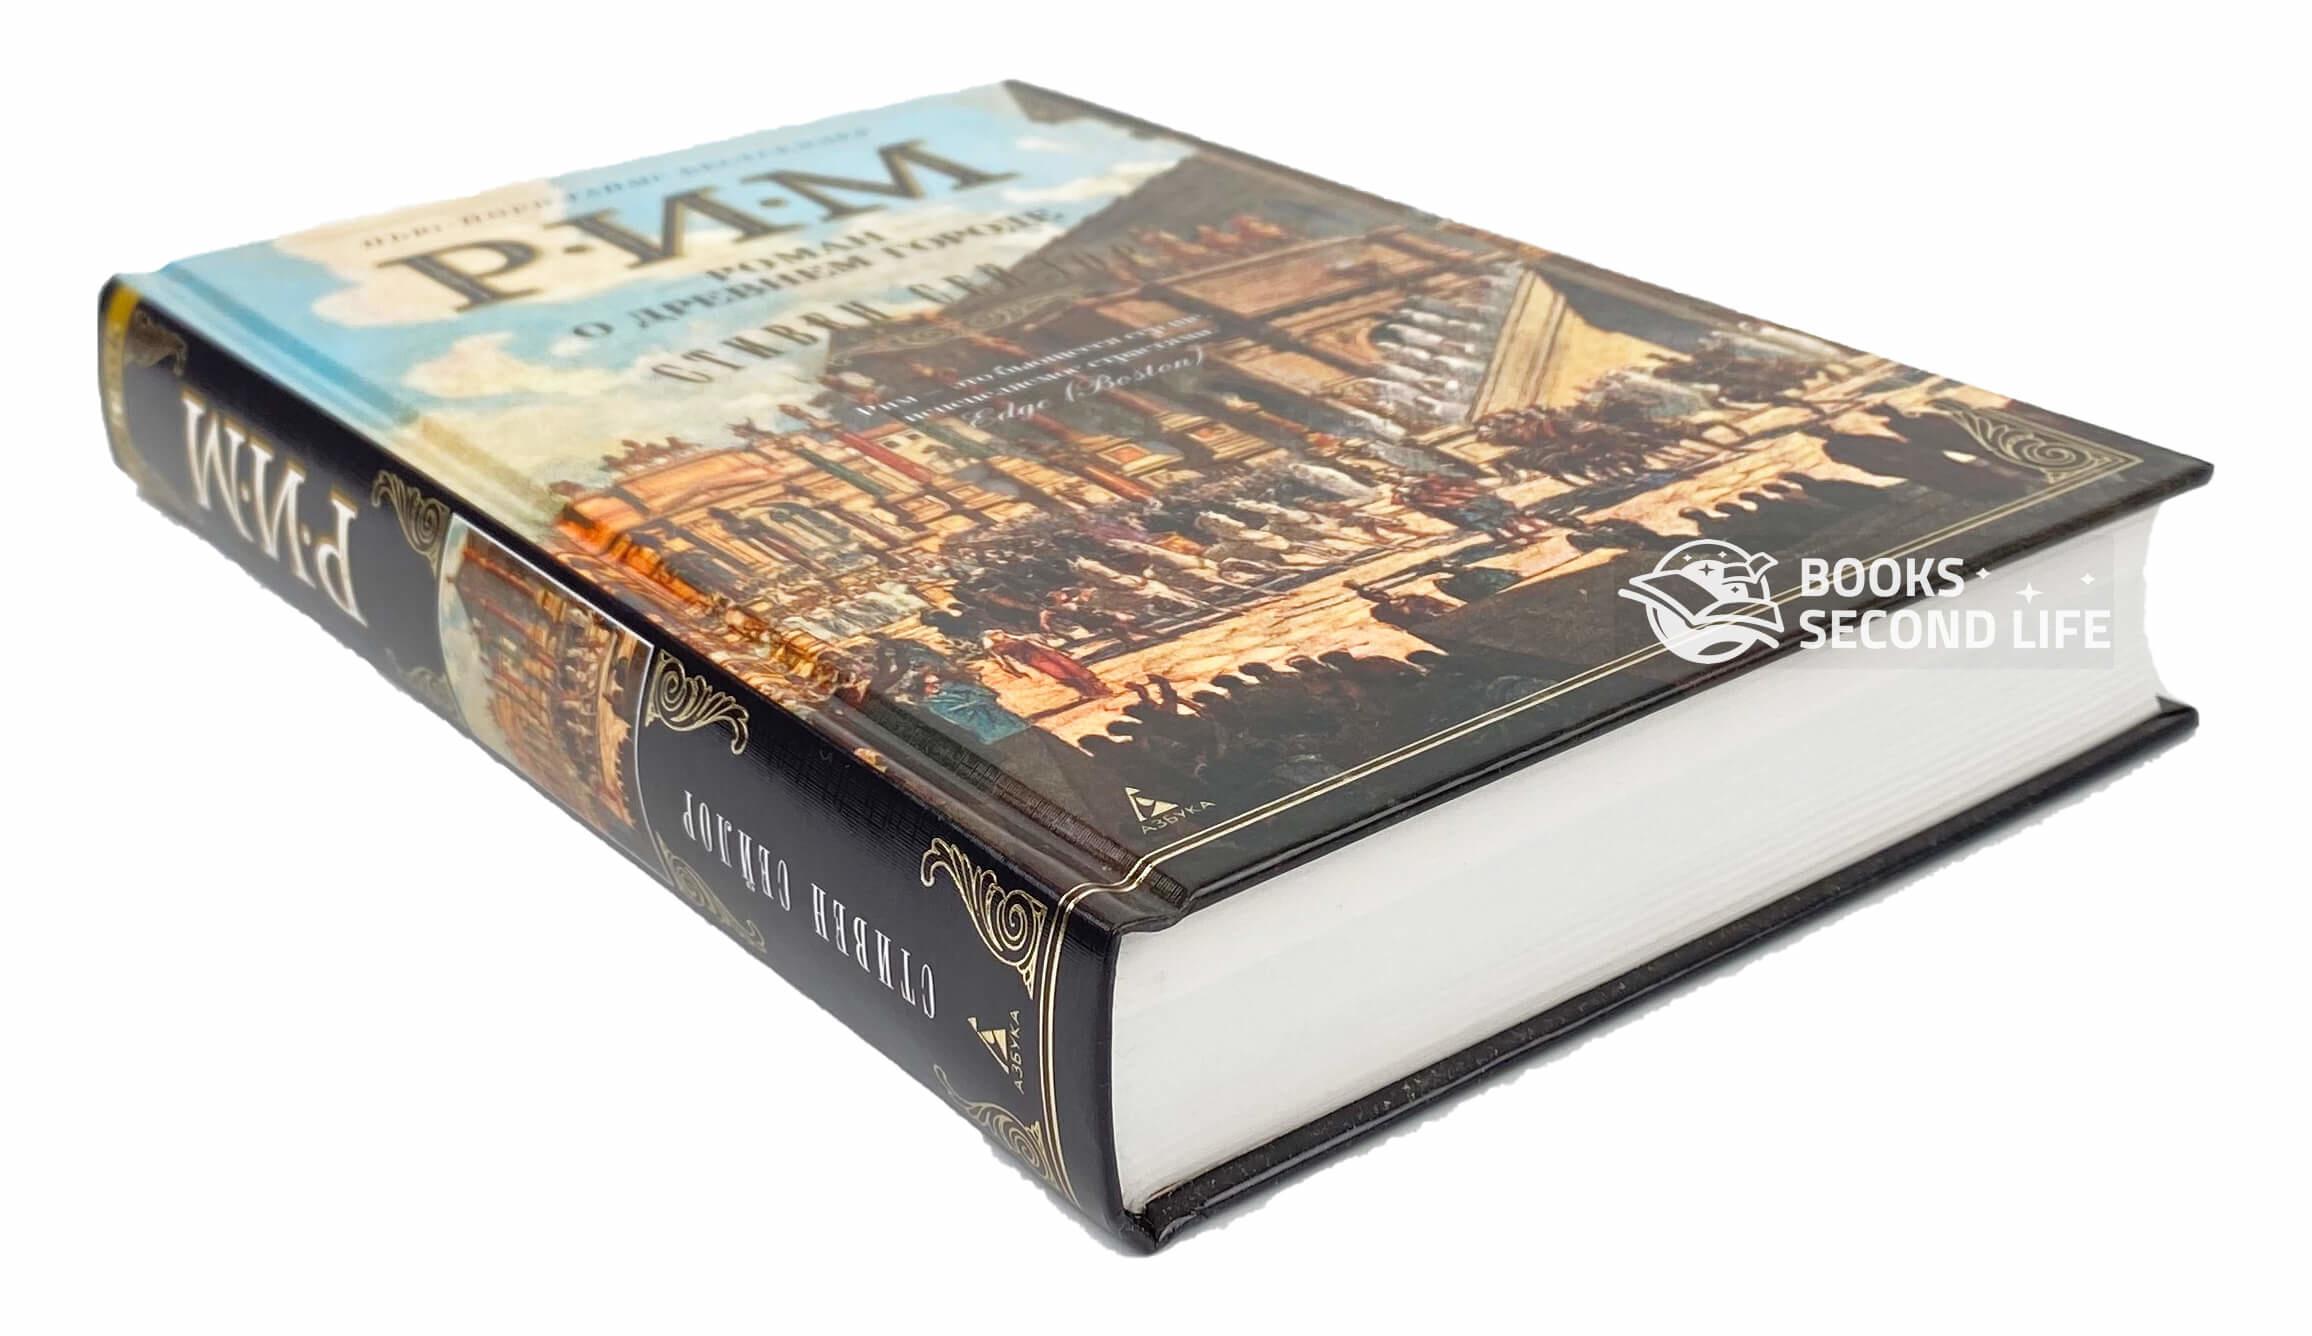 Рим. Роман о древнем городе. Автор — Стивен Сейлор. Переплет —